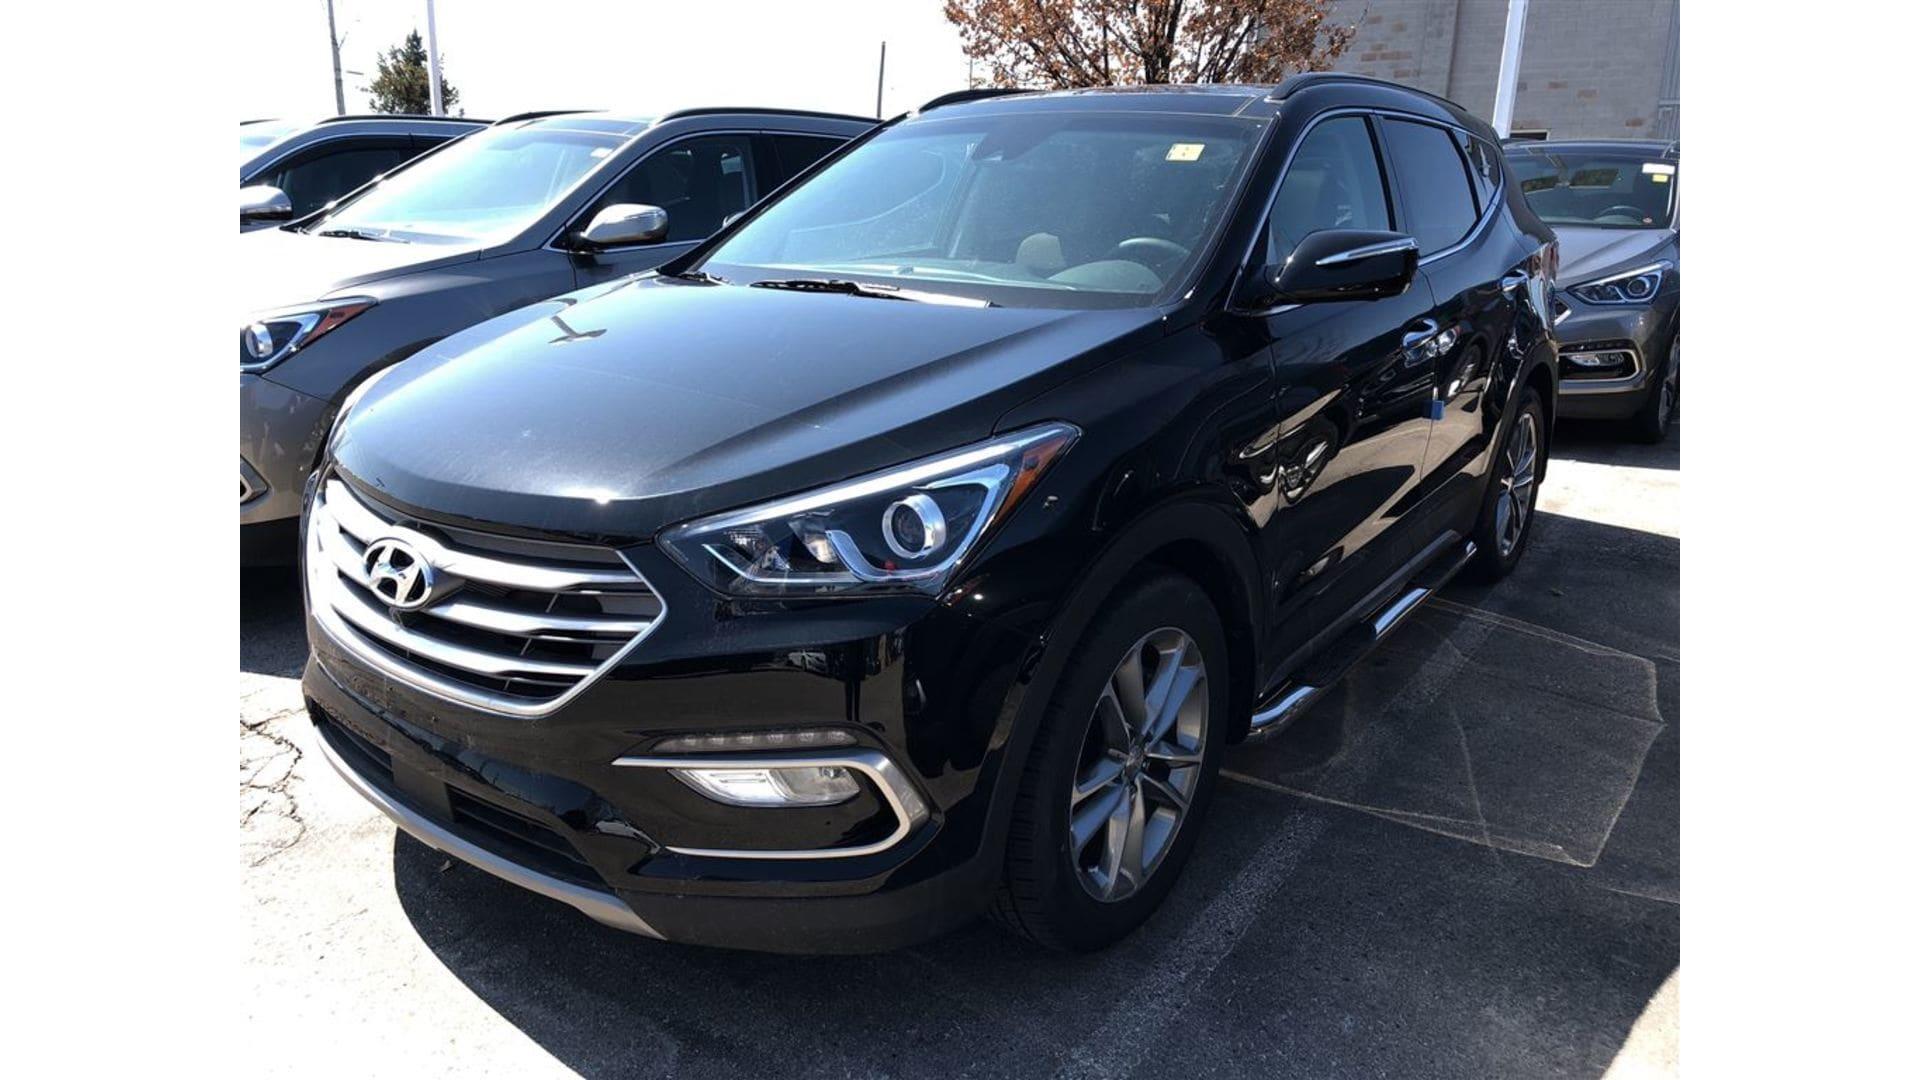 2017 Hyundai Santa Fe 2.0T|AUTO|ULT Sport Utility